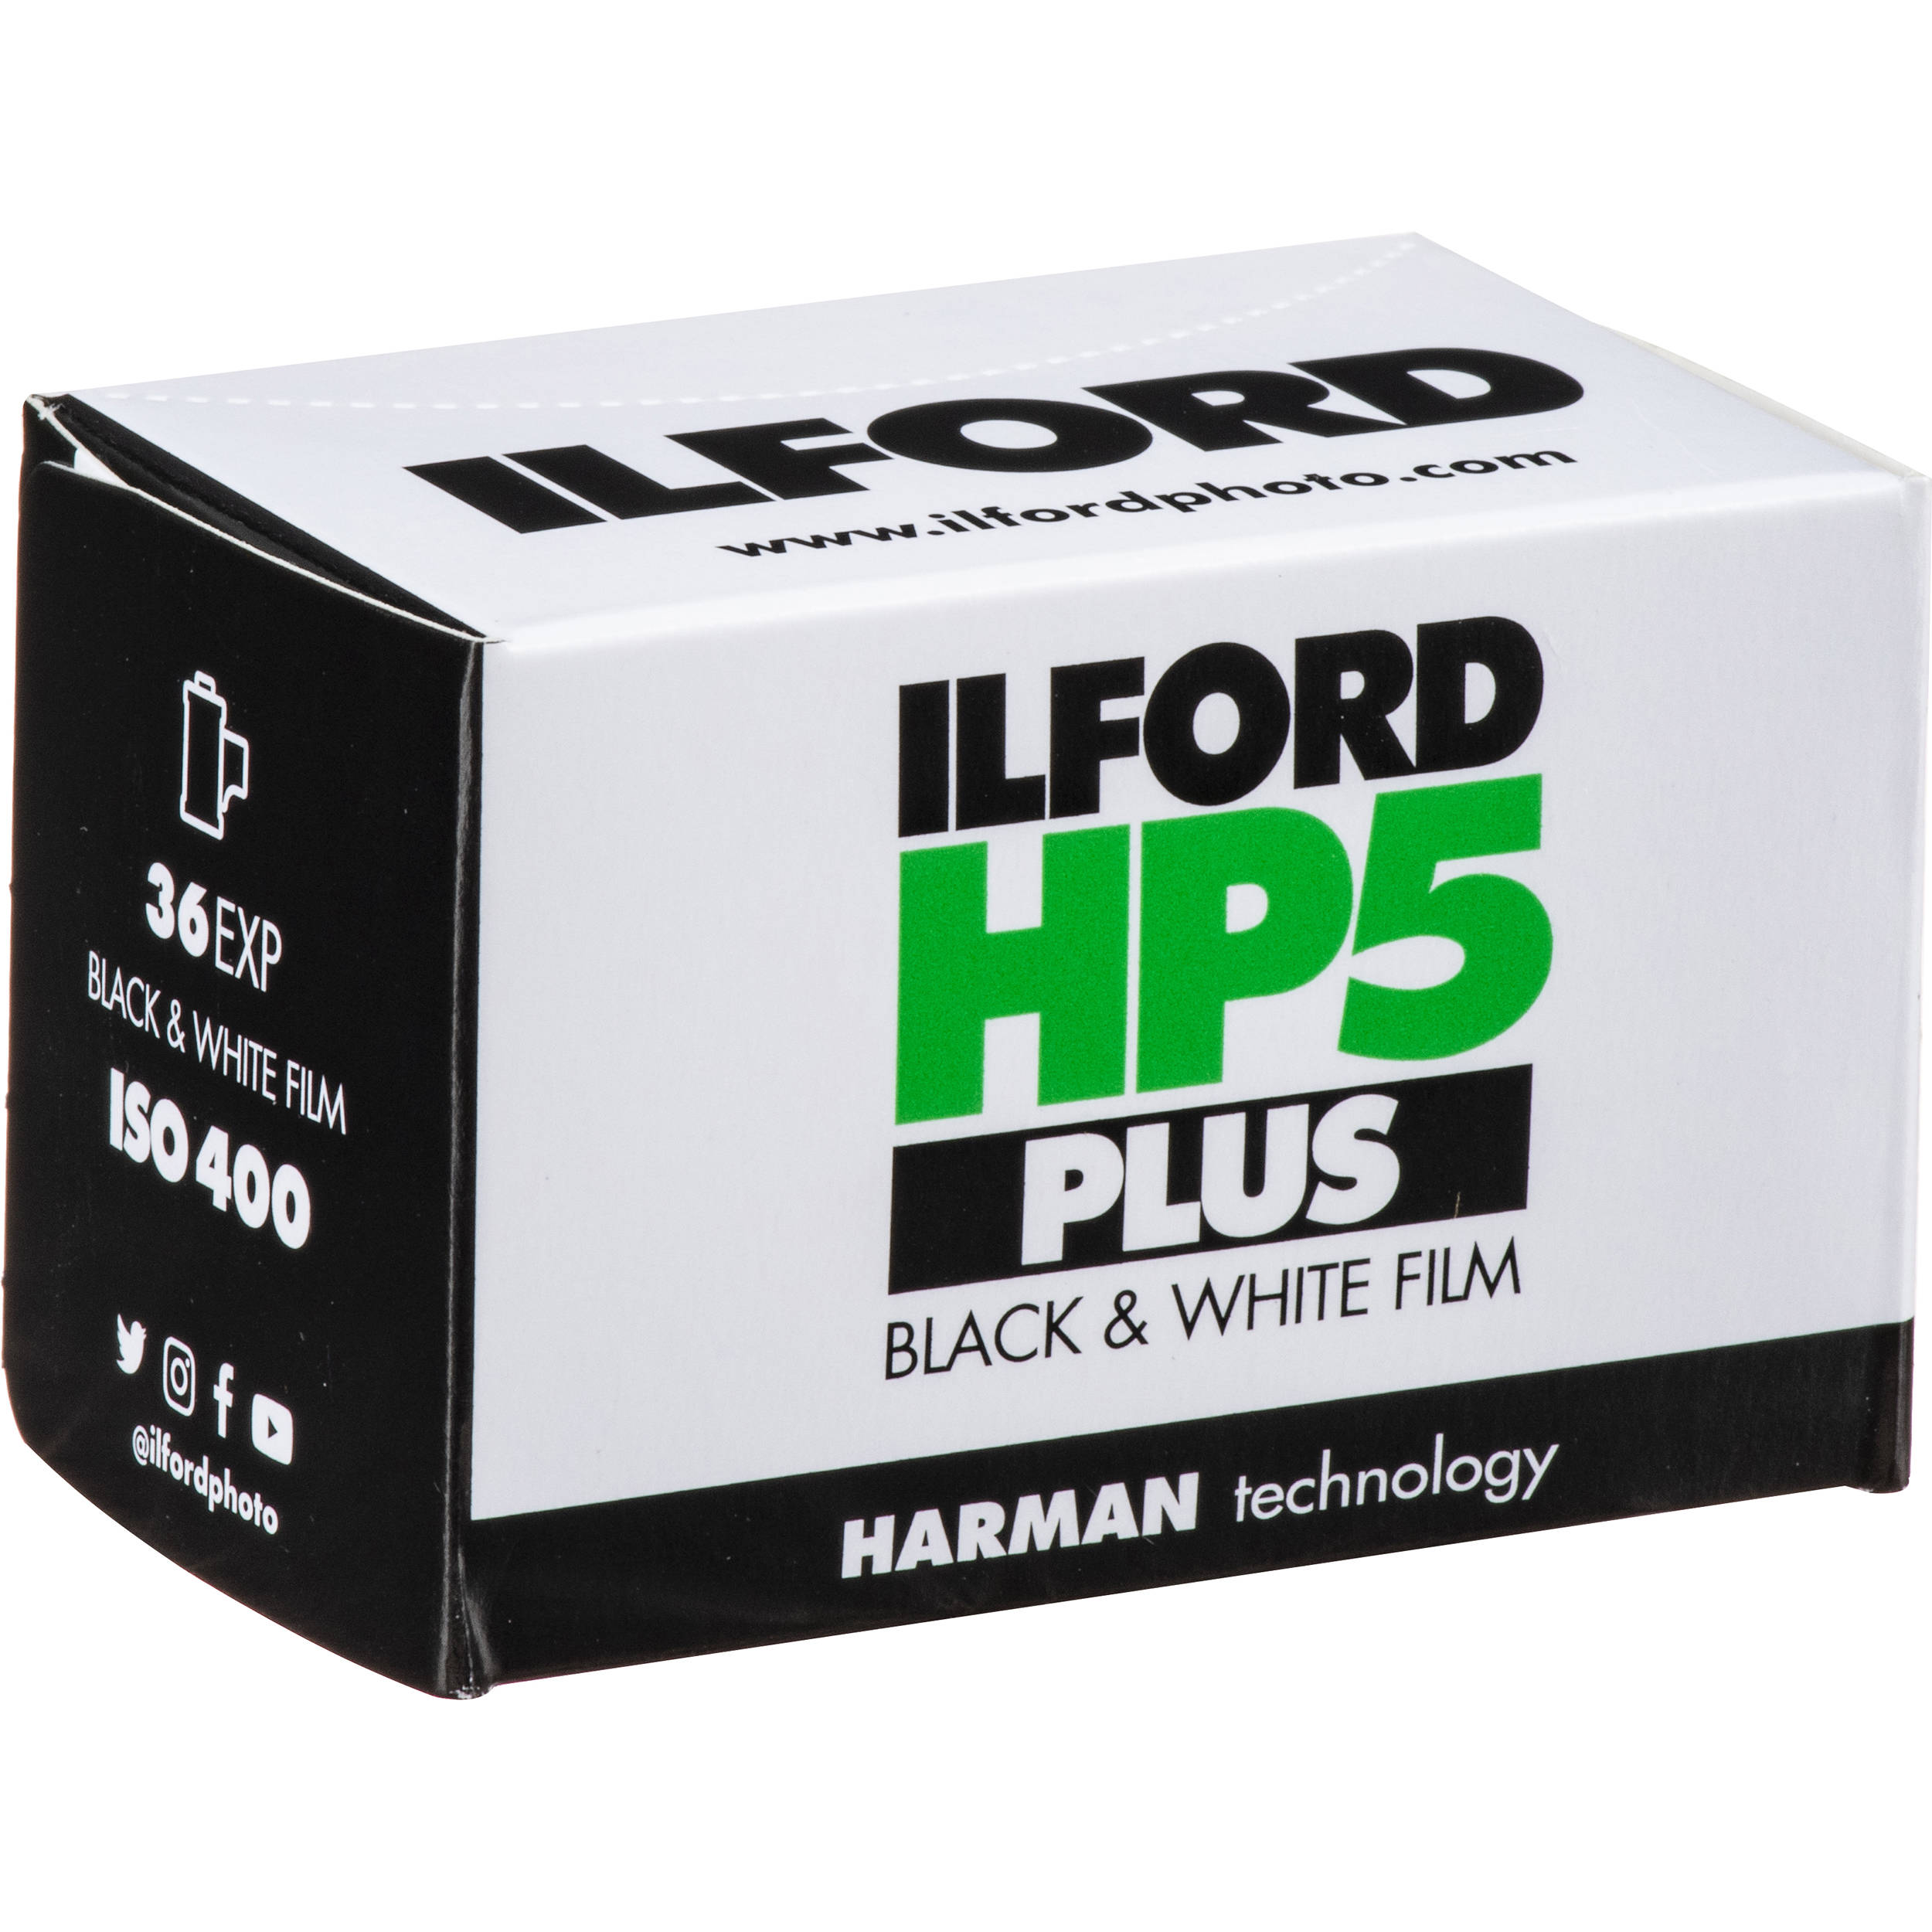 4 x Ilford HP5 Plus 120 Black /& White Roll Film 400 ISO 36 EXP